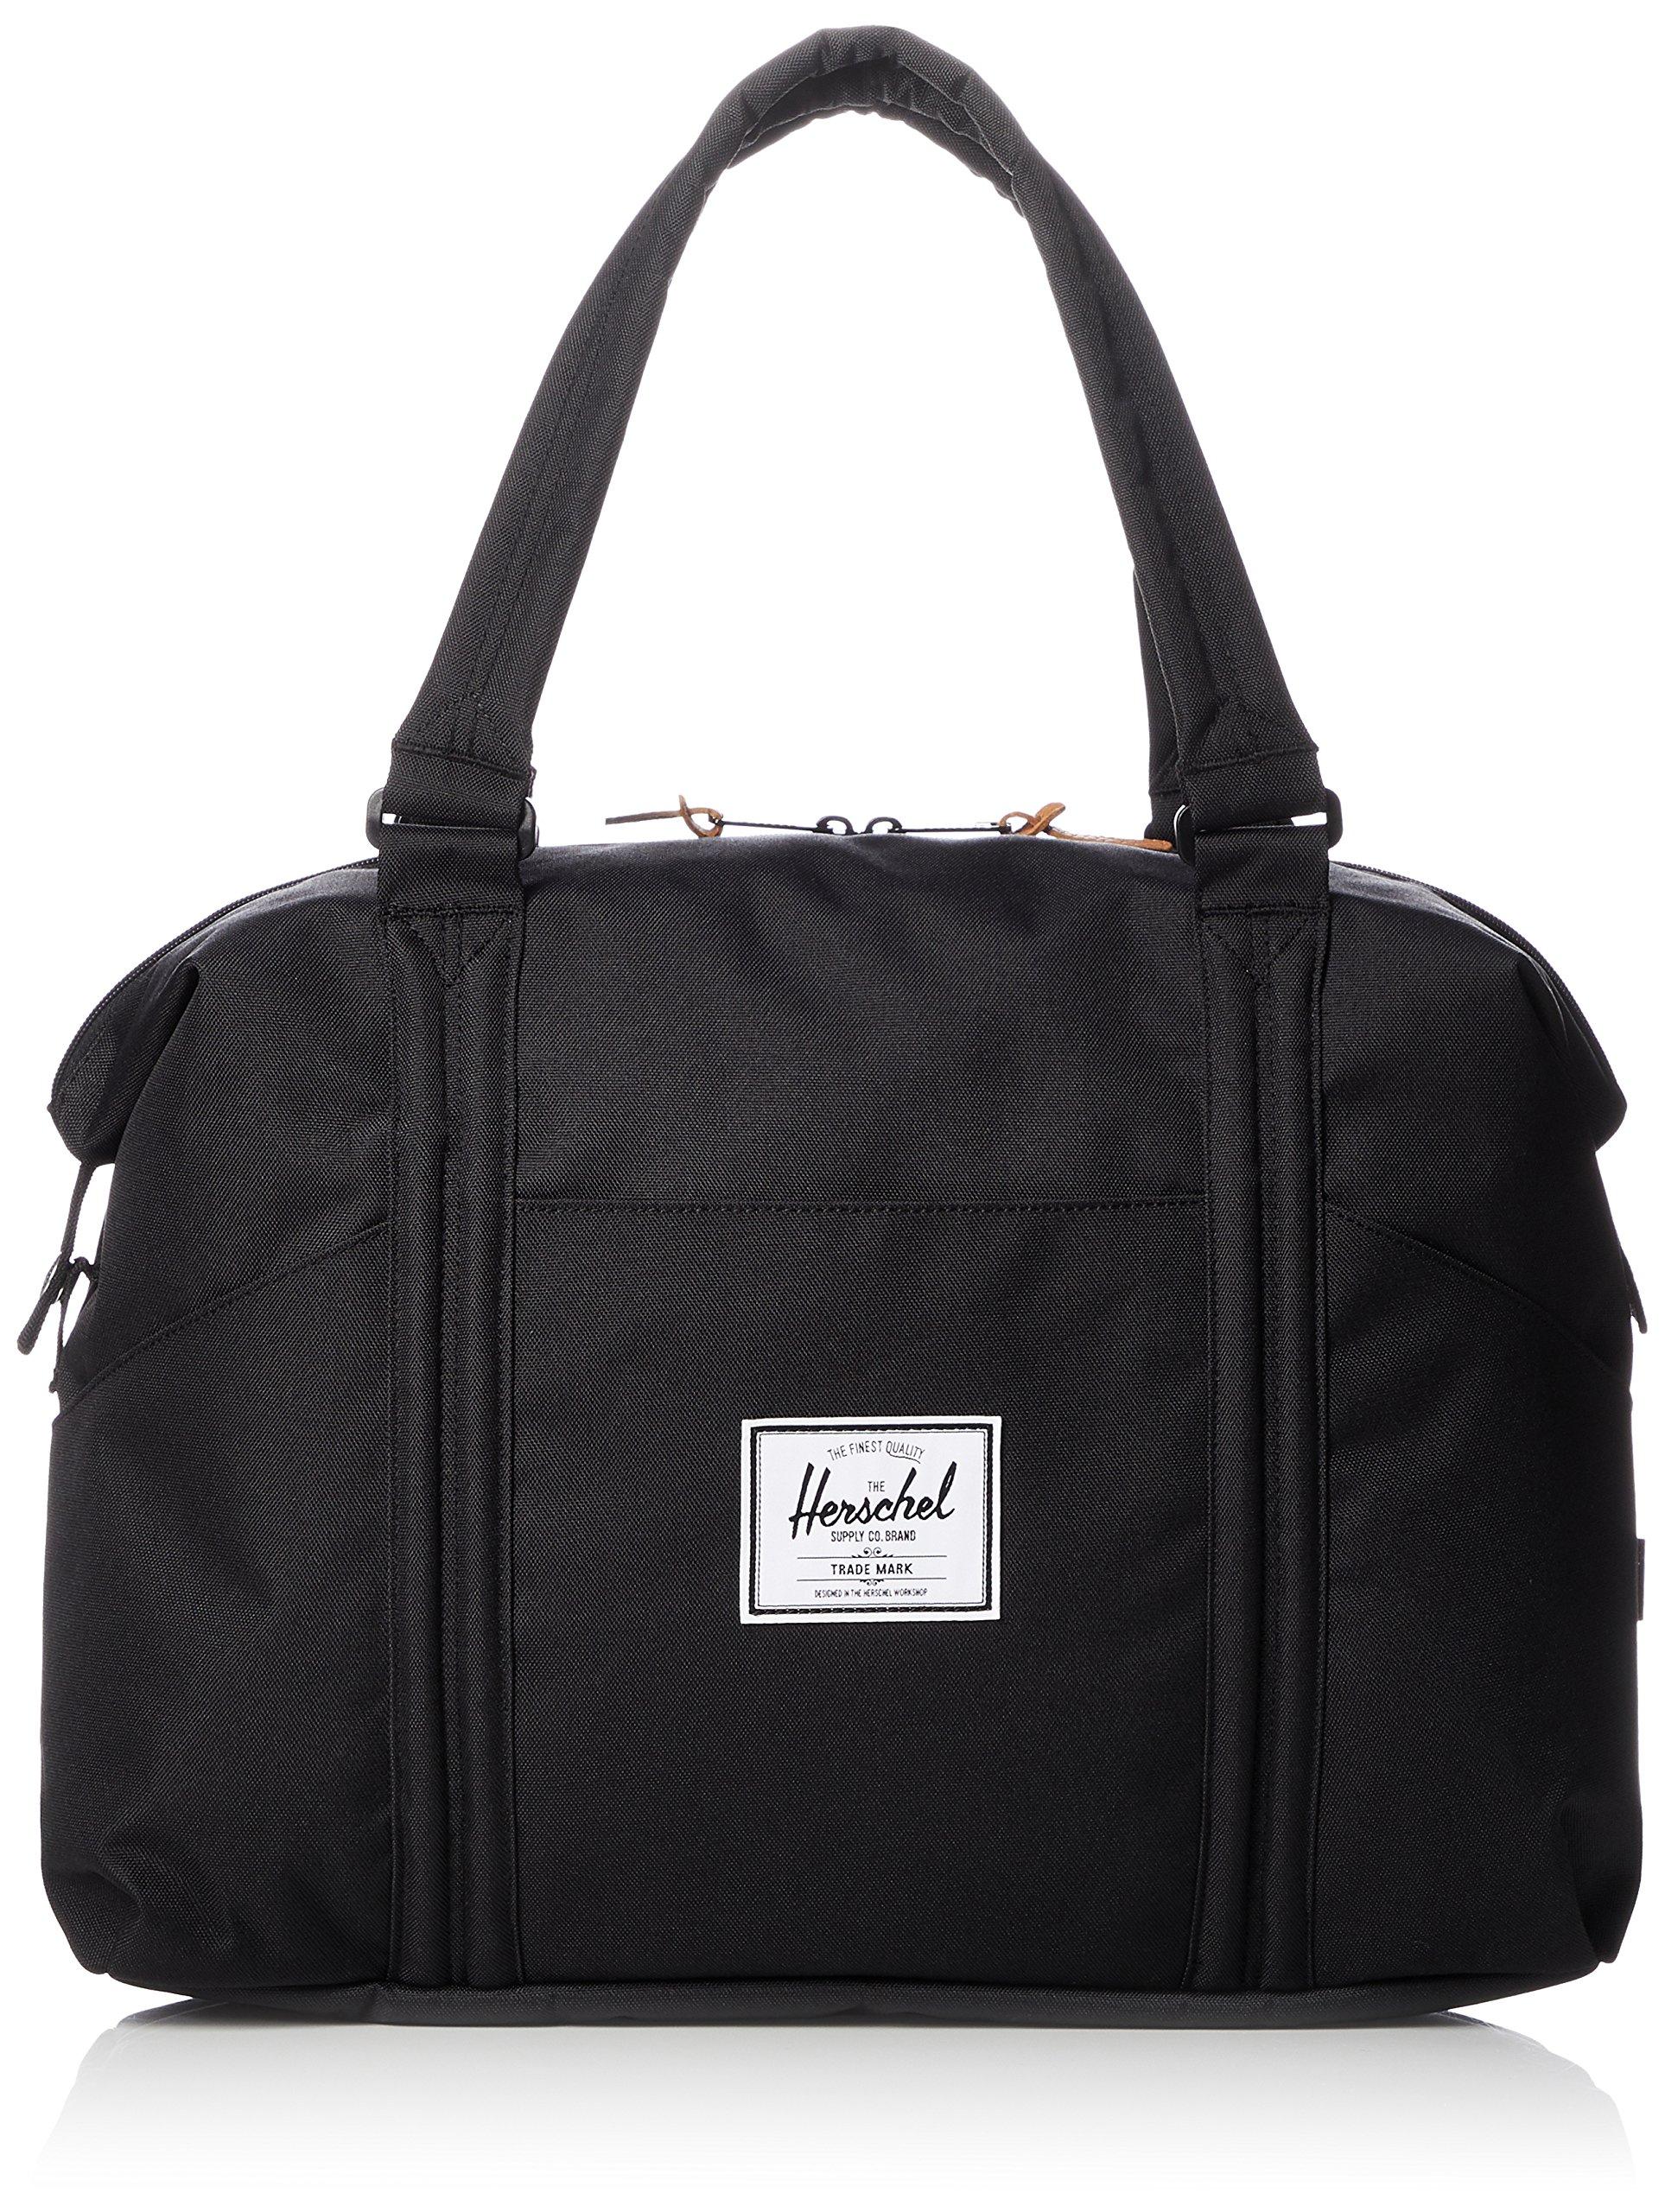 Herschel Supply Co. Strand Duffle Bag, Black, One Size